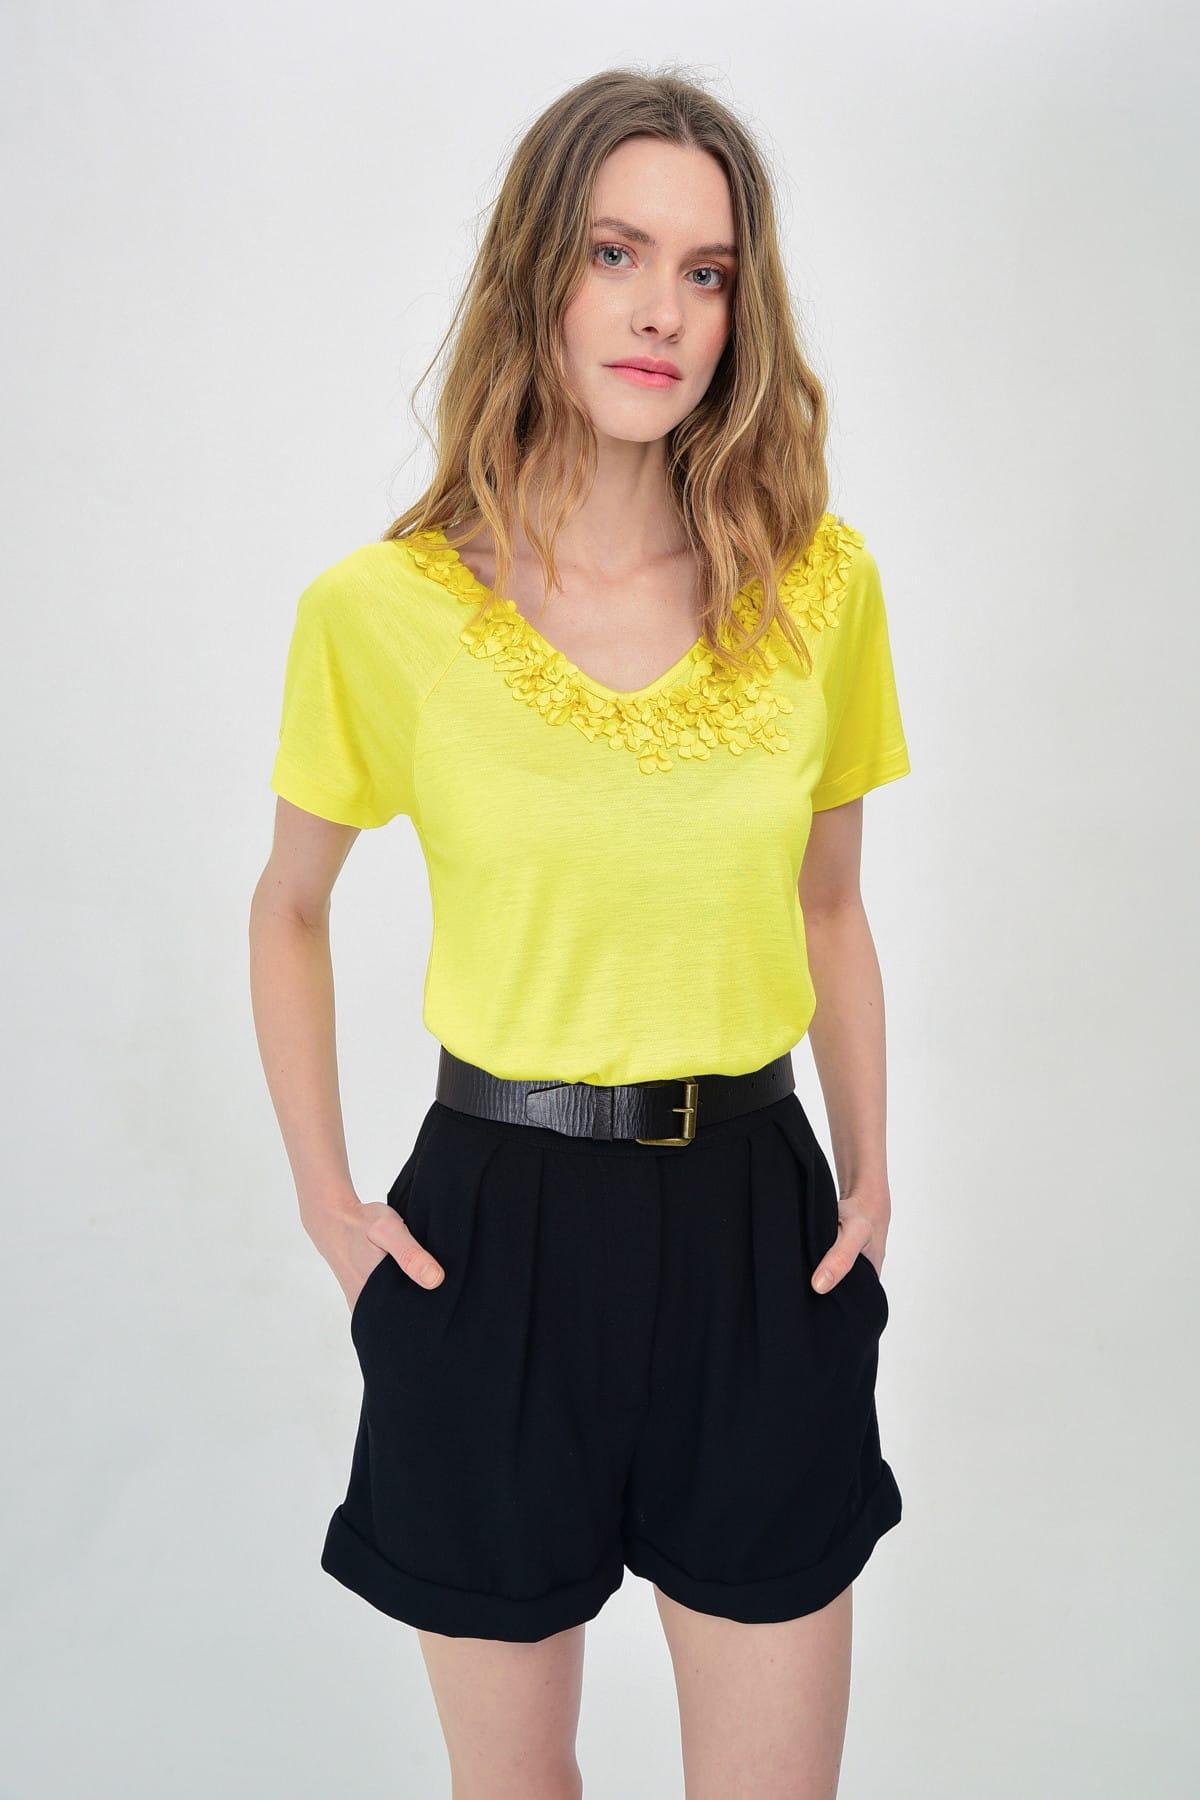 Hanna's by Hanna Darsa Kadın Sarı Çiçek Detaylı Kısa Kollu T-Shirt Hn1489 1